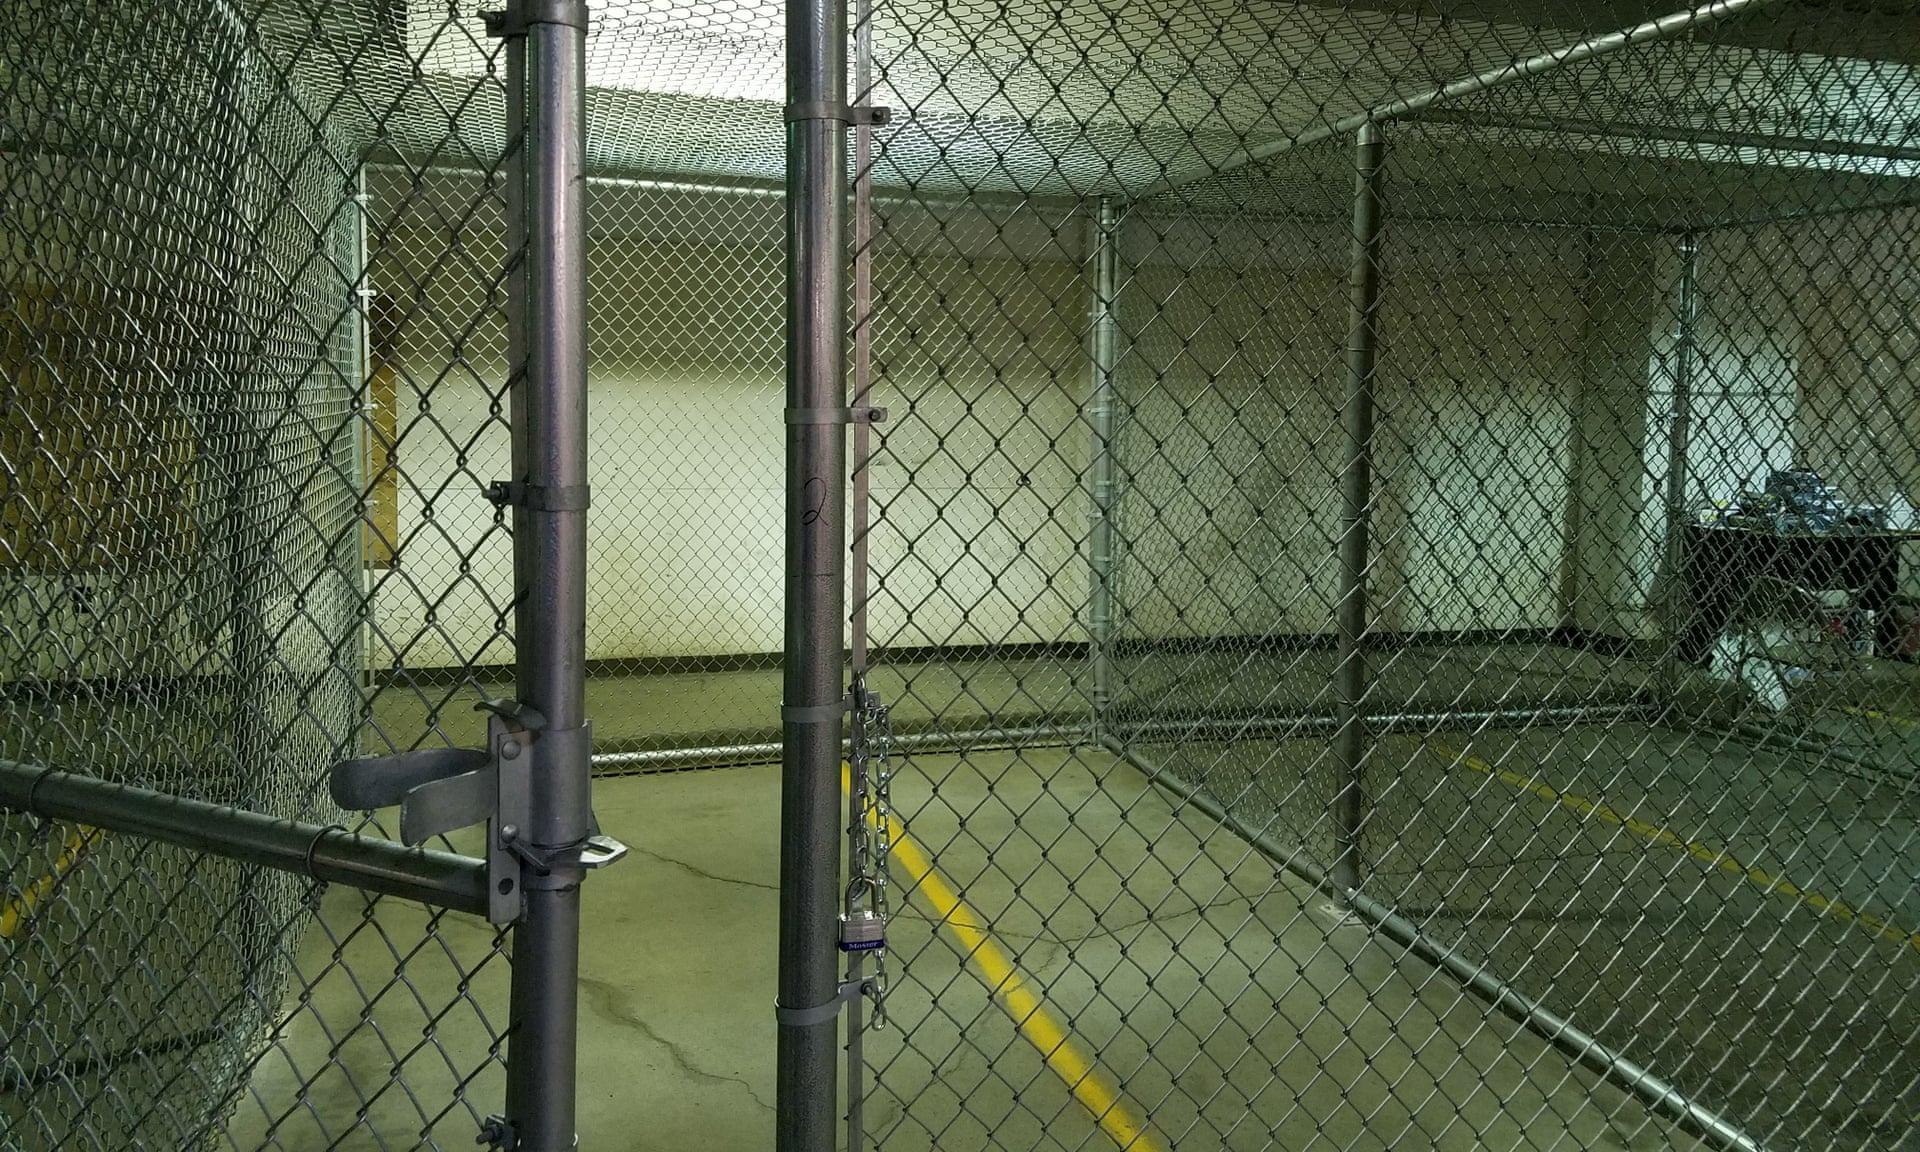 Dakota Protesters In Dog Kennels